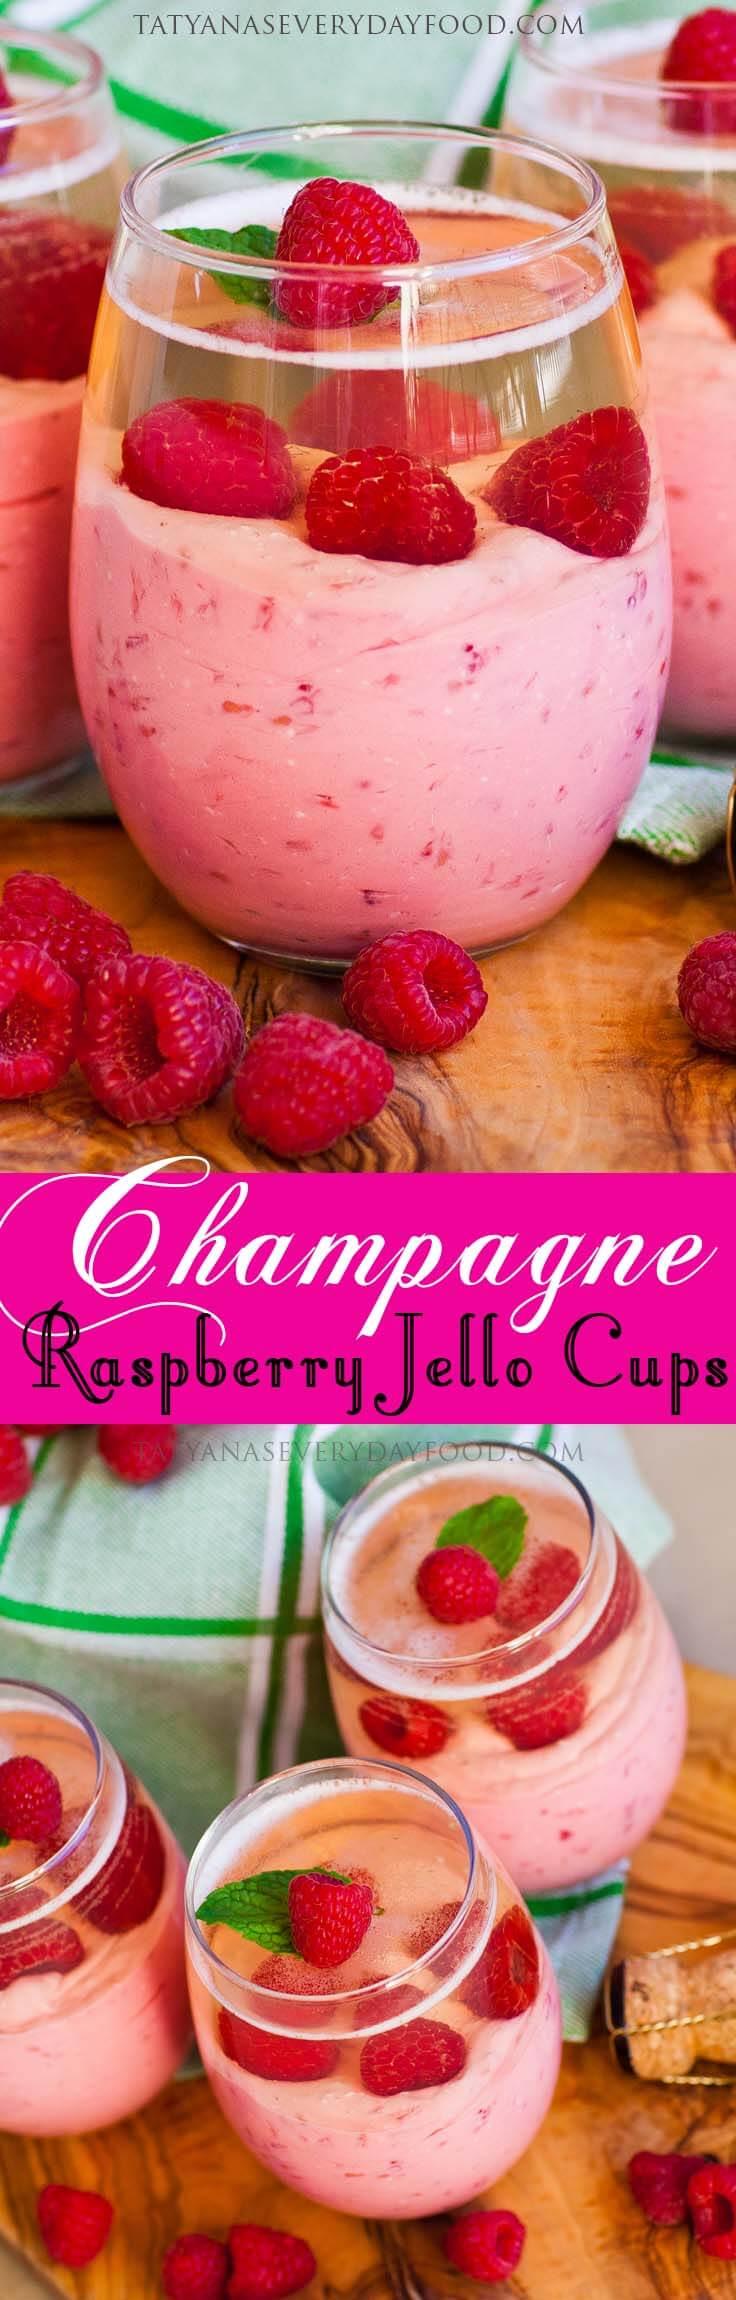 Raspberry Mousse Jello Cups video recipe